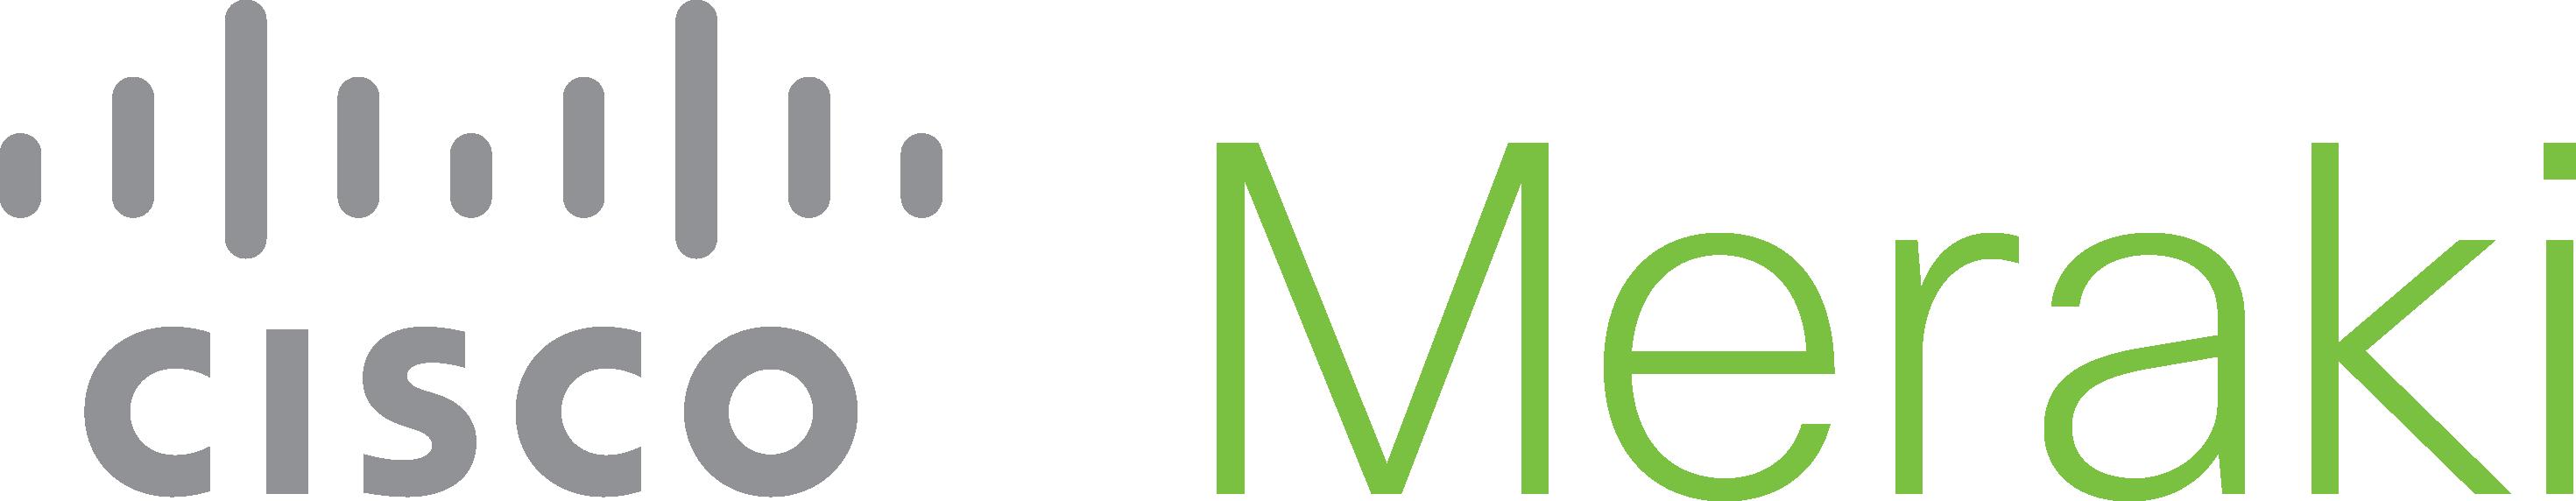 Ignite Alliance is an authorised Cisco Meraki partner.